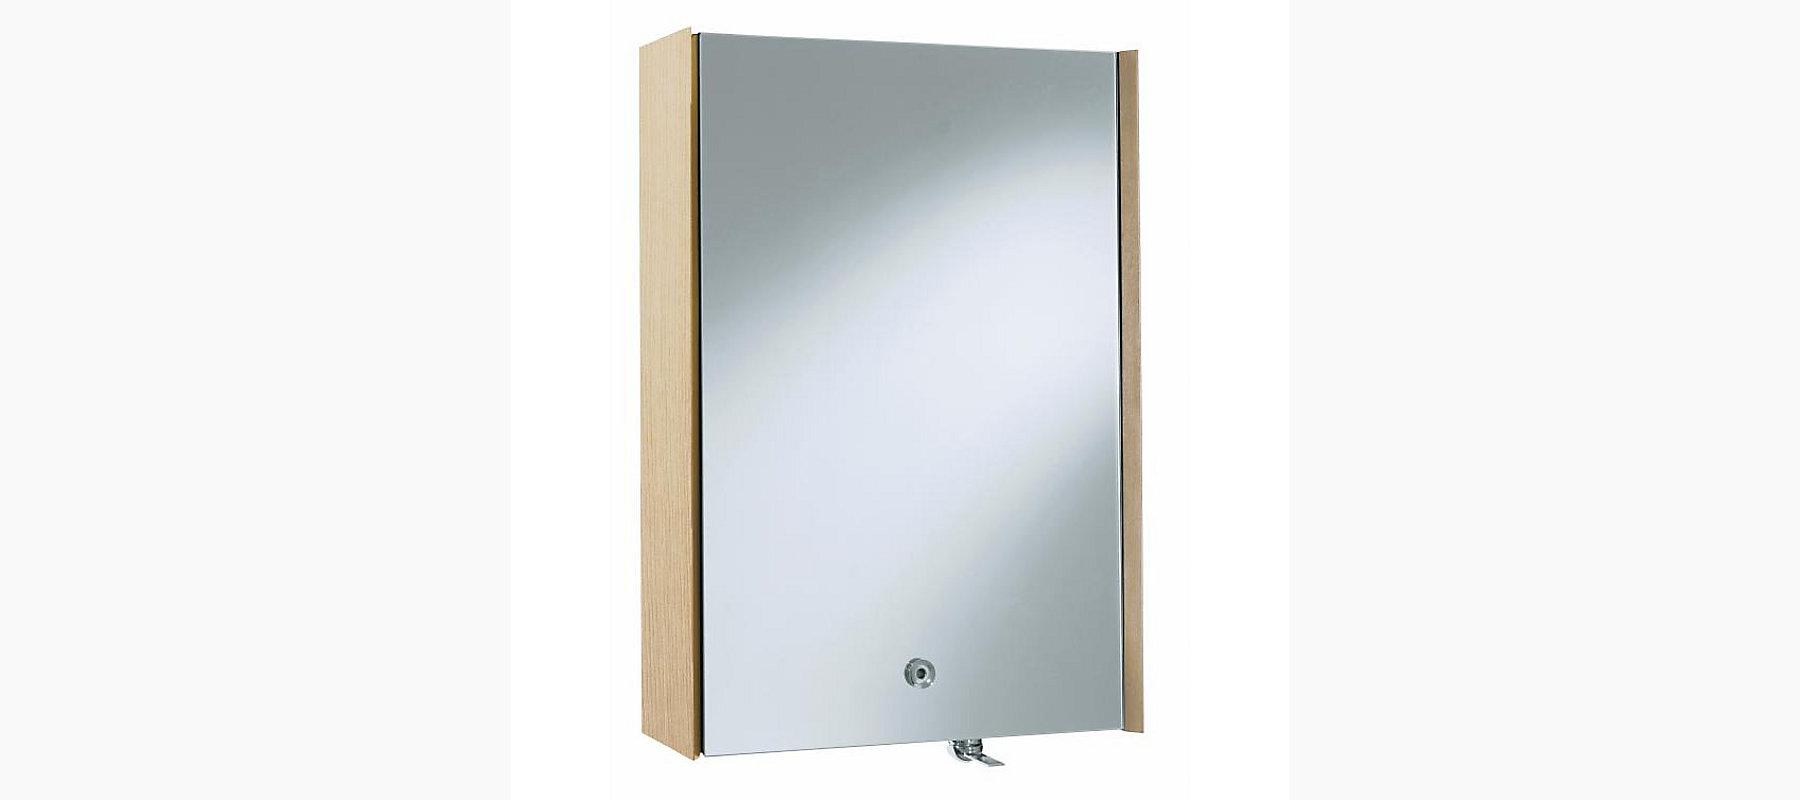 24 X 36 Medicine Cabinet Purist 24 W X 36 H Wood Medicine Cabinet With Integral Laminar